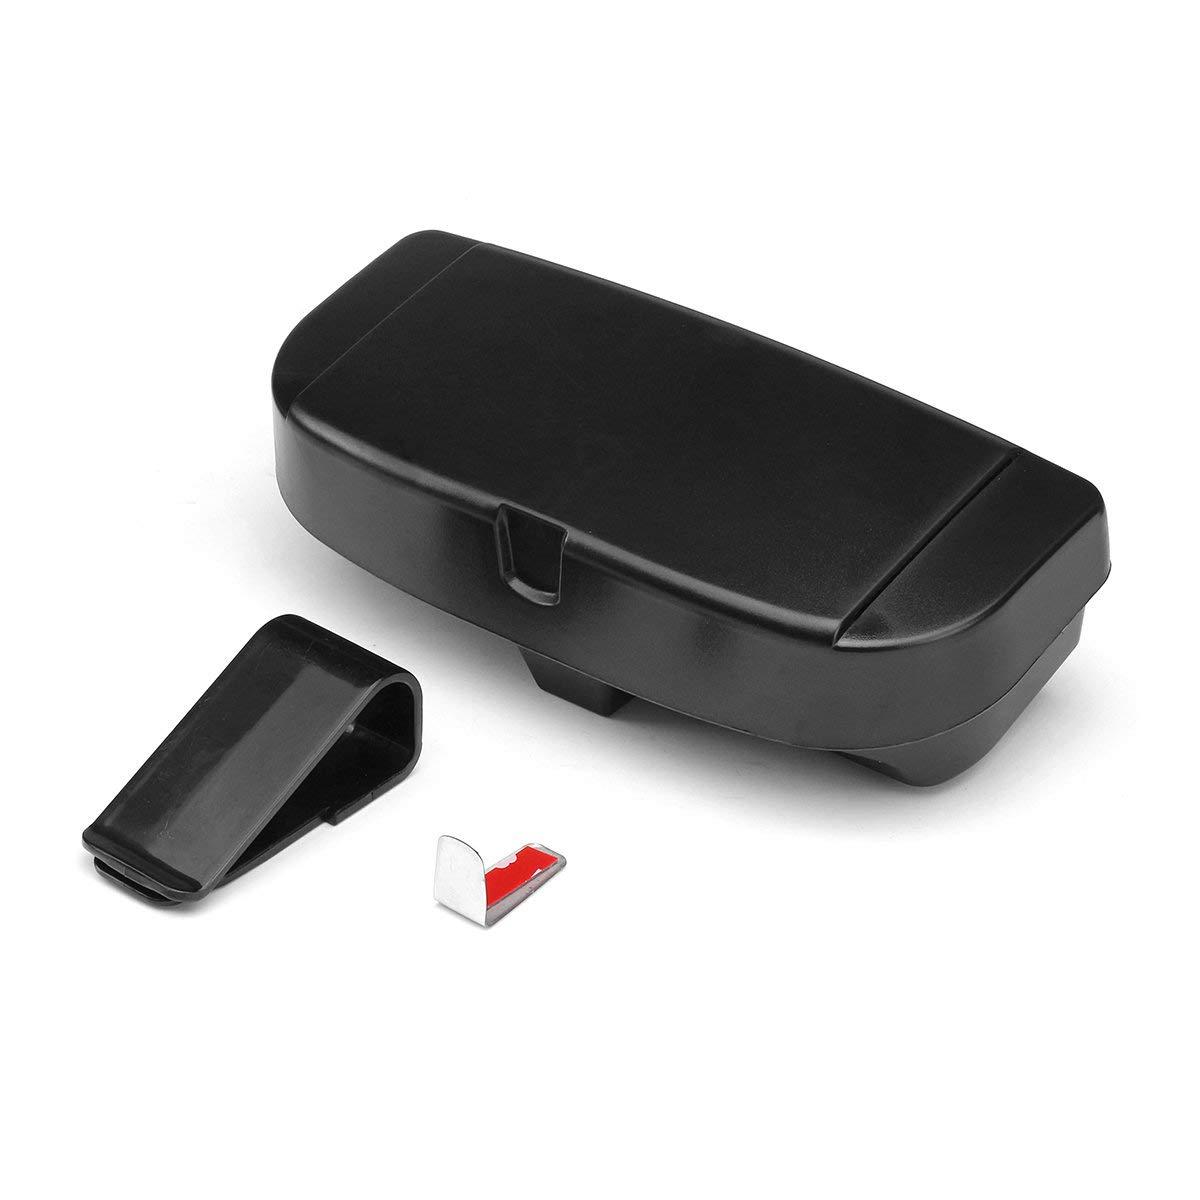 Shield Won Favorable Universal Large Capacity Sun Visor Accessory Storage Box Card Slot Phone Holder by Shield Won